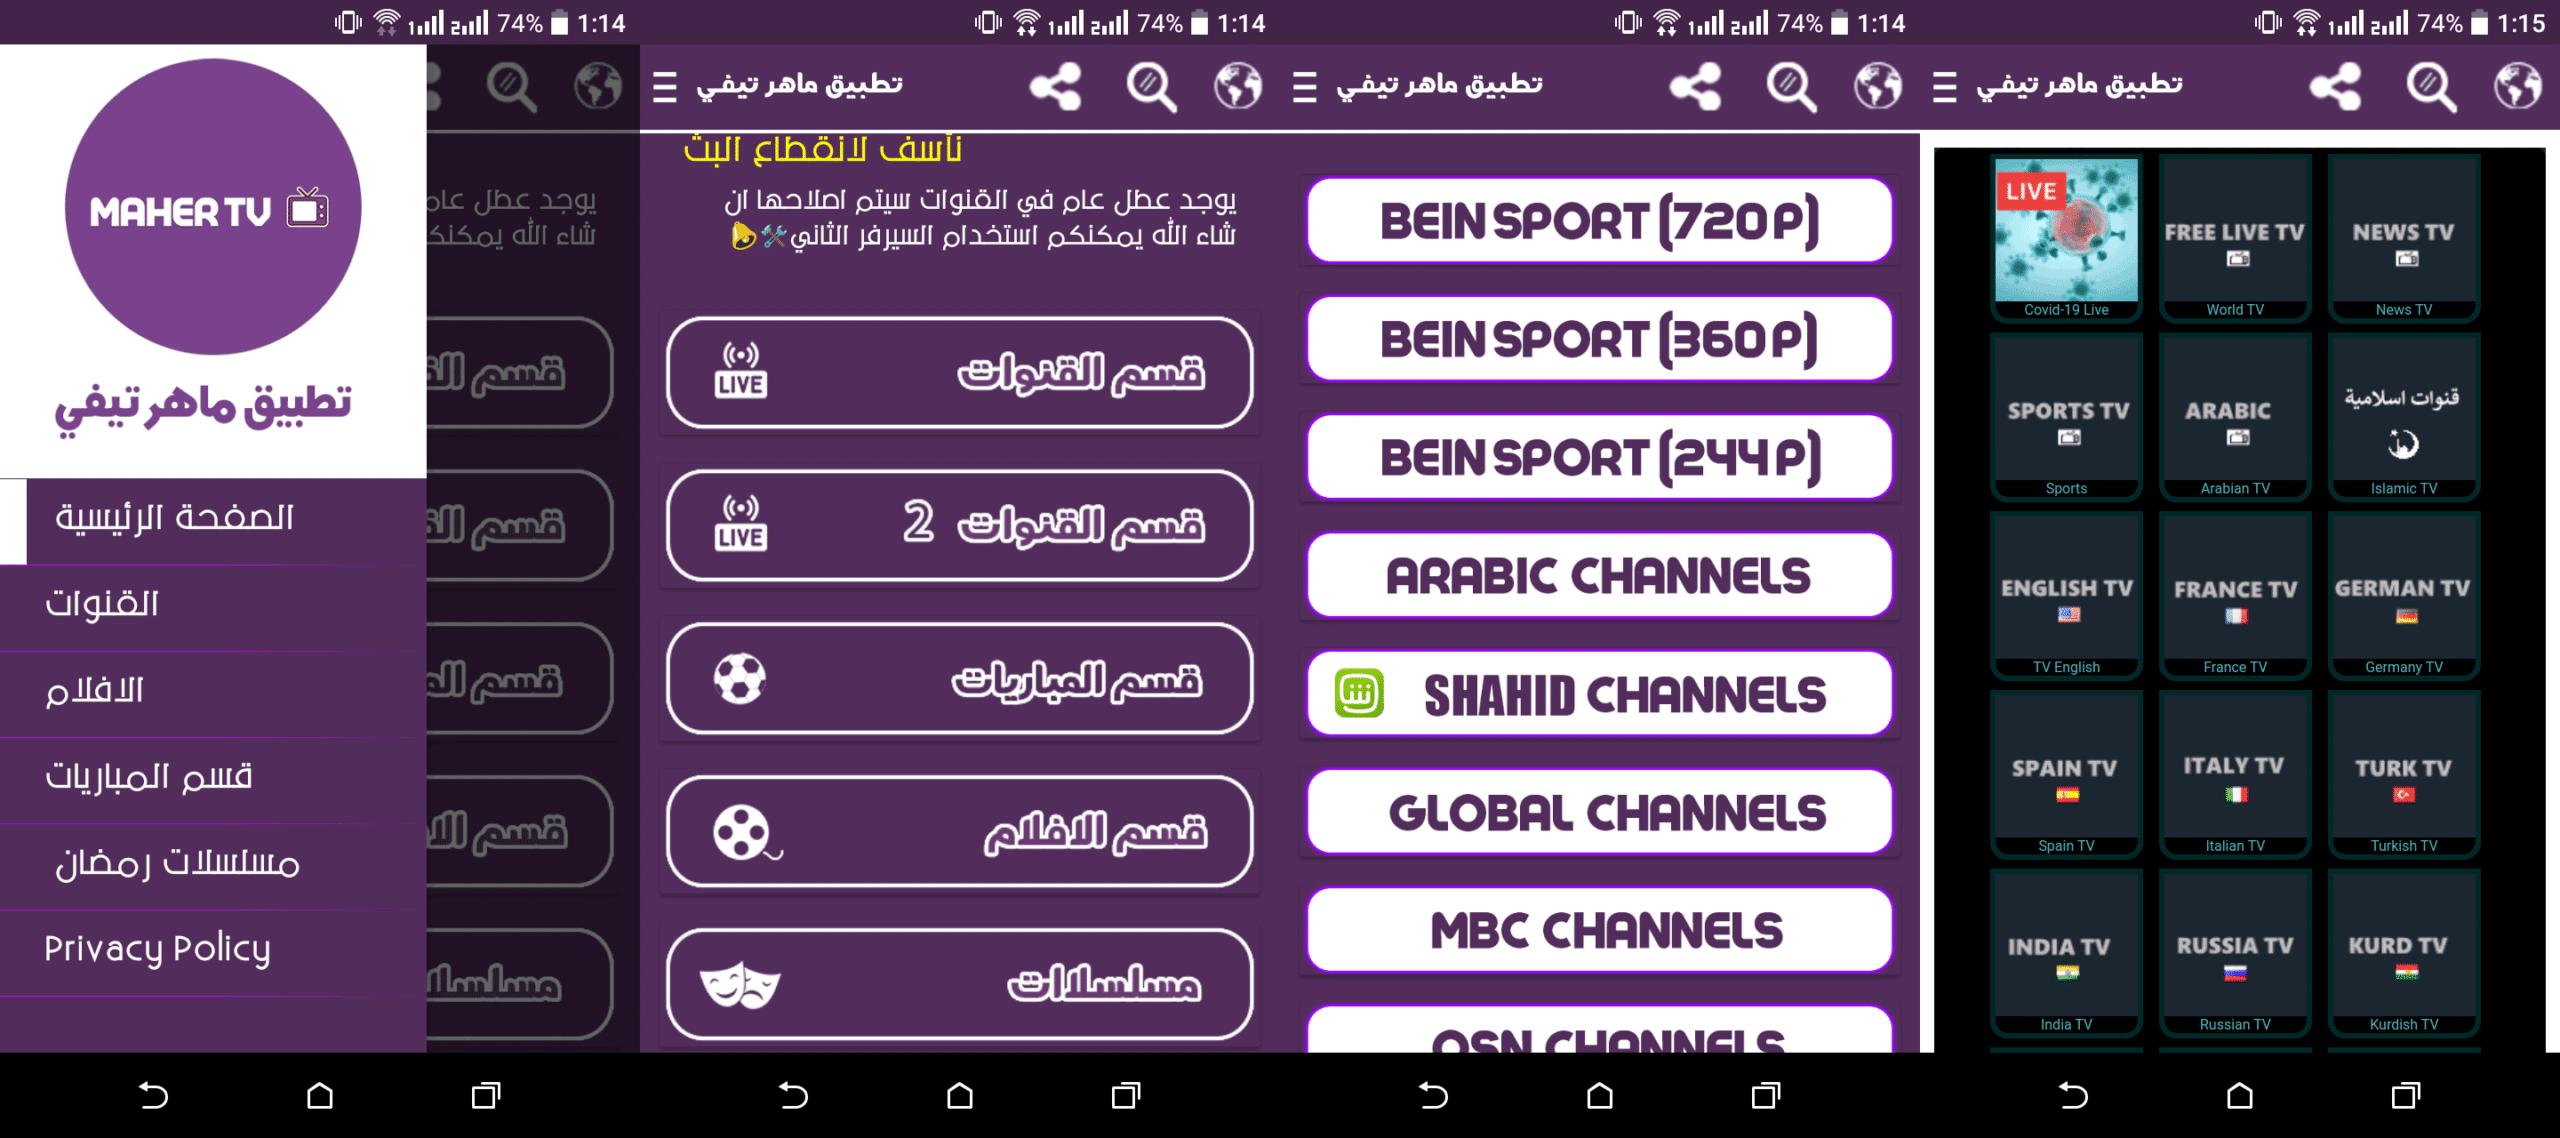 Mahar tv Pro  apk [Latest] 2020 Android 2